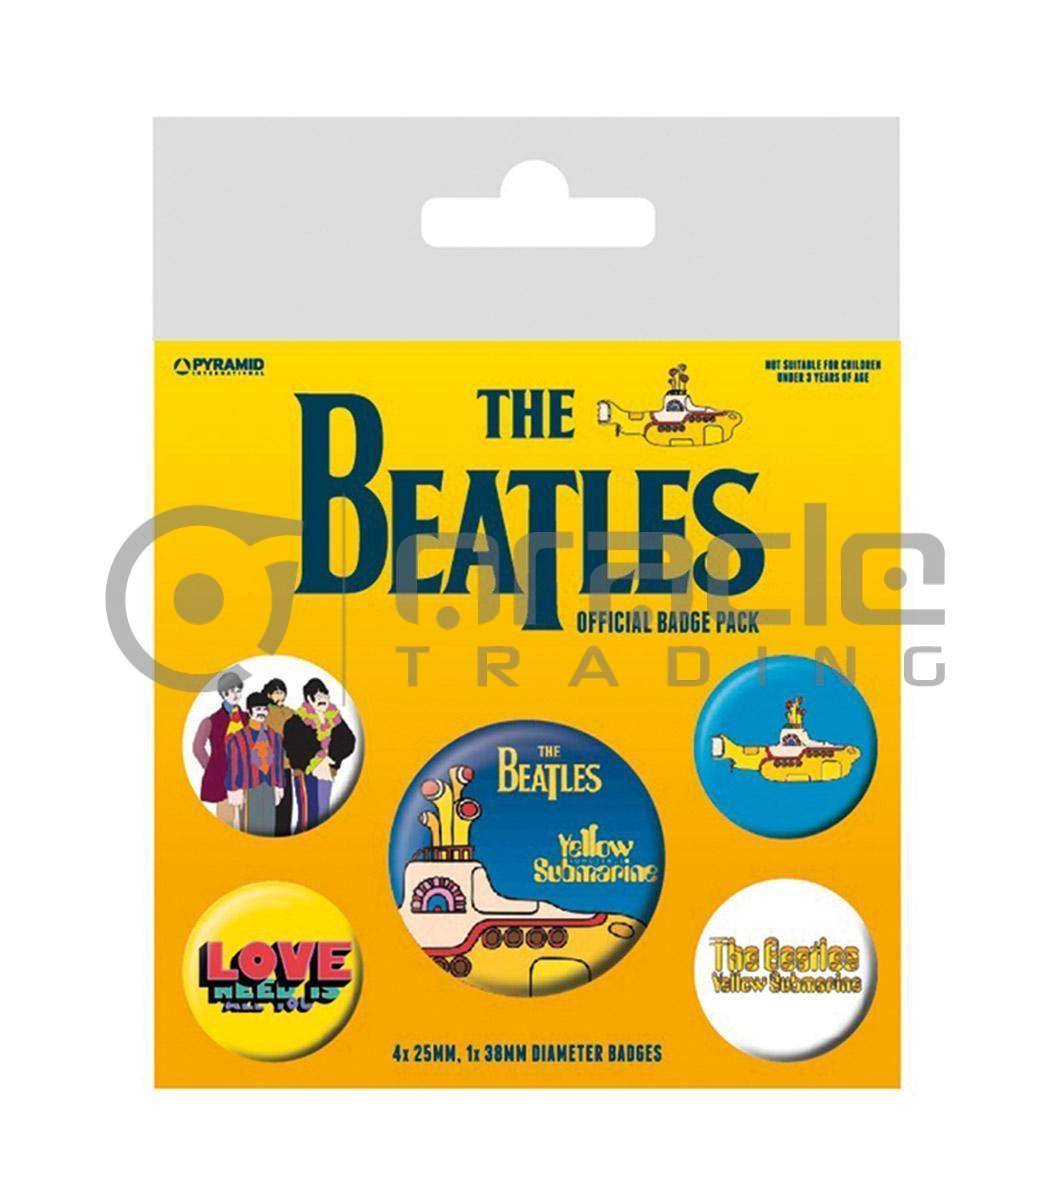 The Beatles Sgt. Pepper Badge Pack